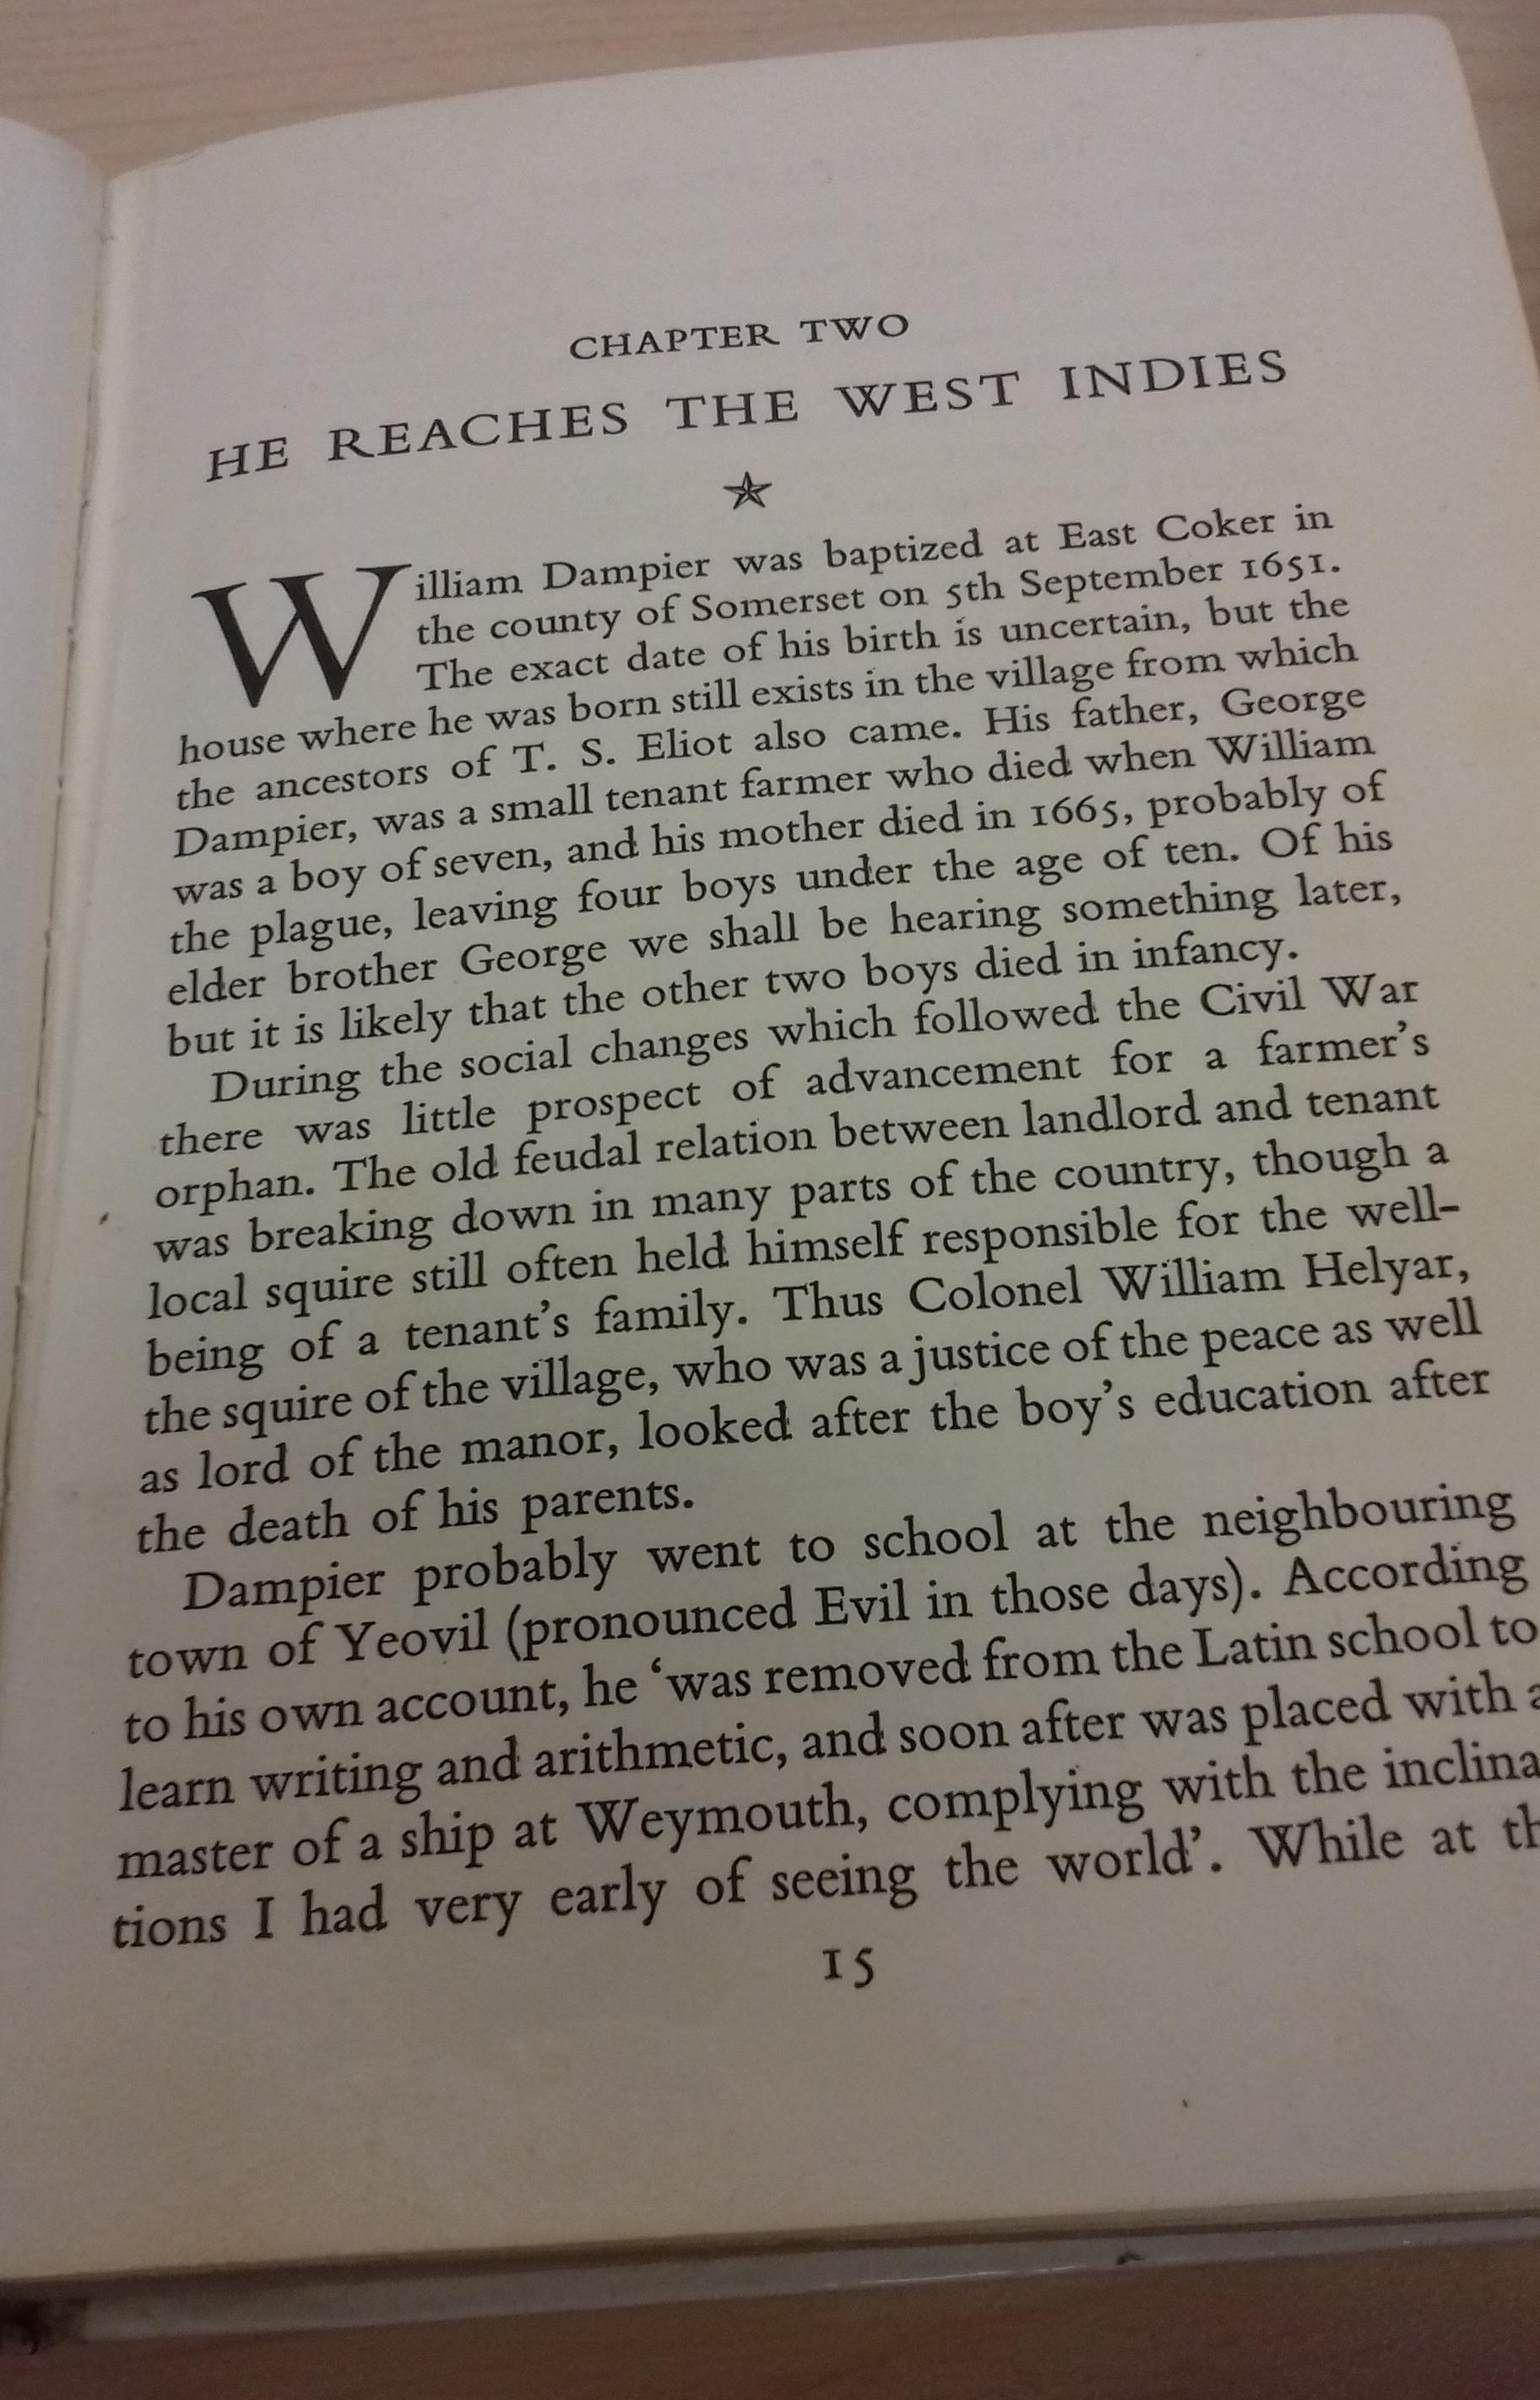 A page of the book describing Dampier